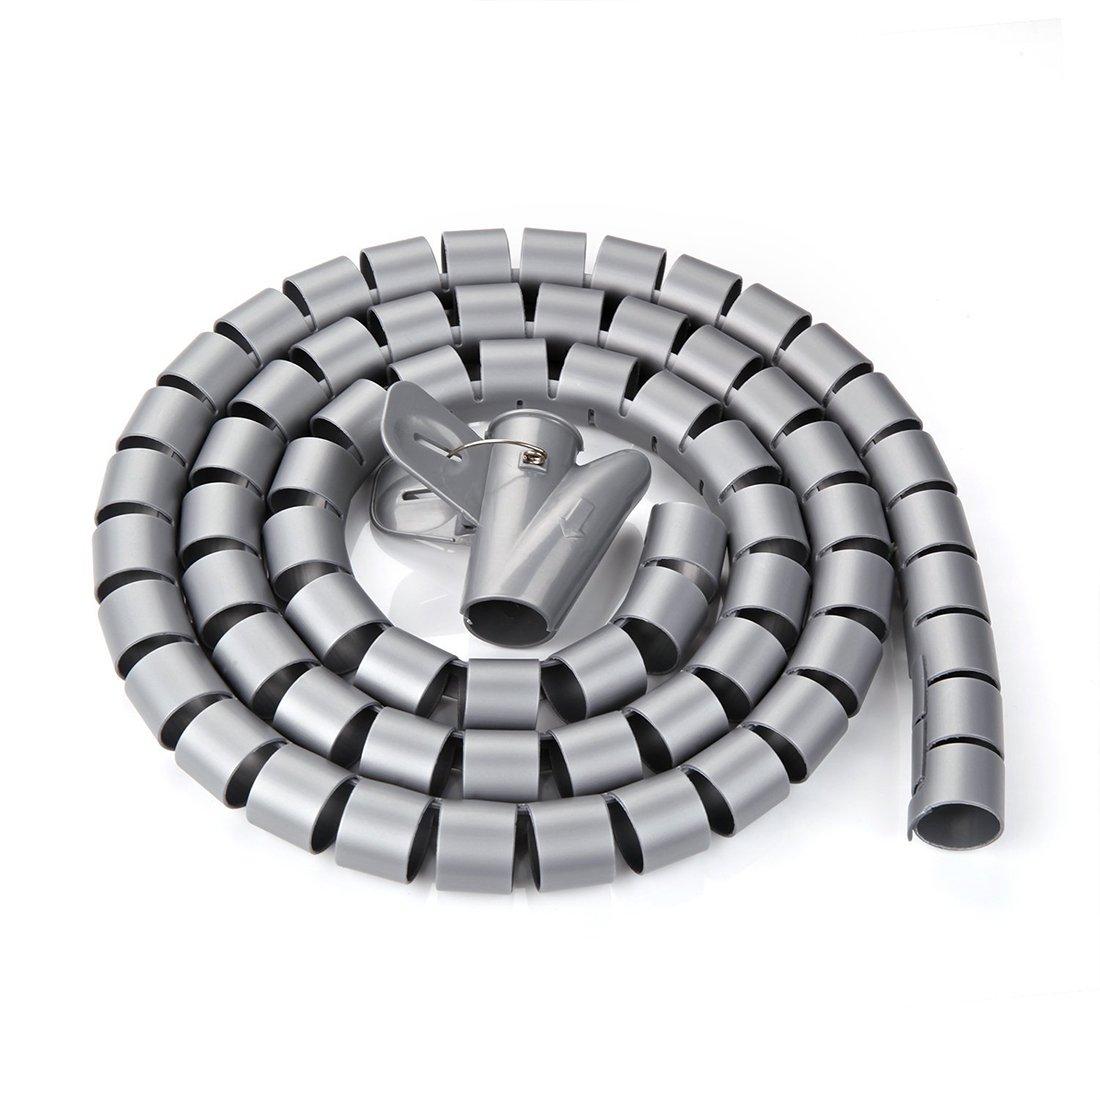 sourcingmap® 10mm Tube Flexible spirale Enveloppe fil de câble Ordinateur gérer Corde 1M avec agrafe US-SA-AJD-272568